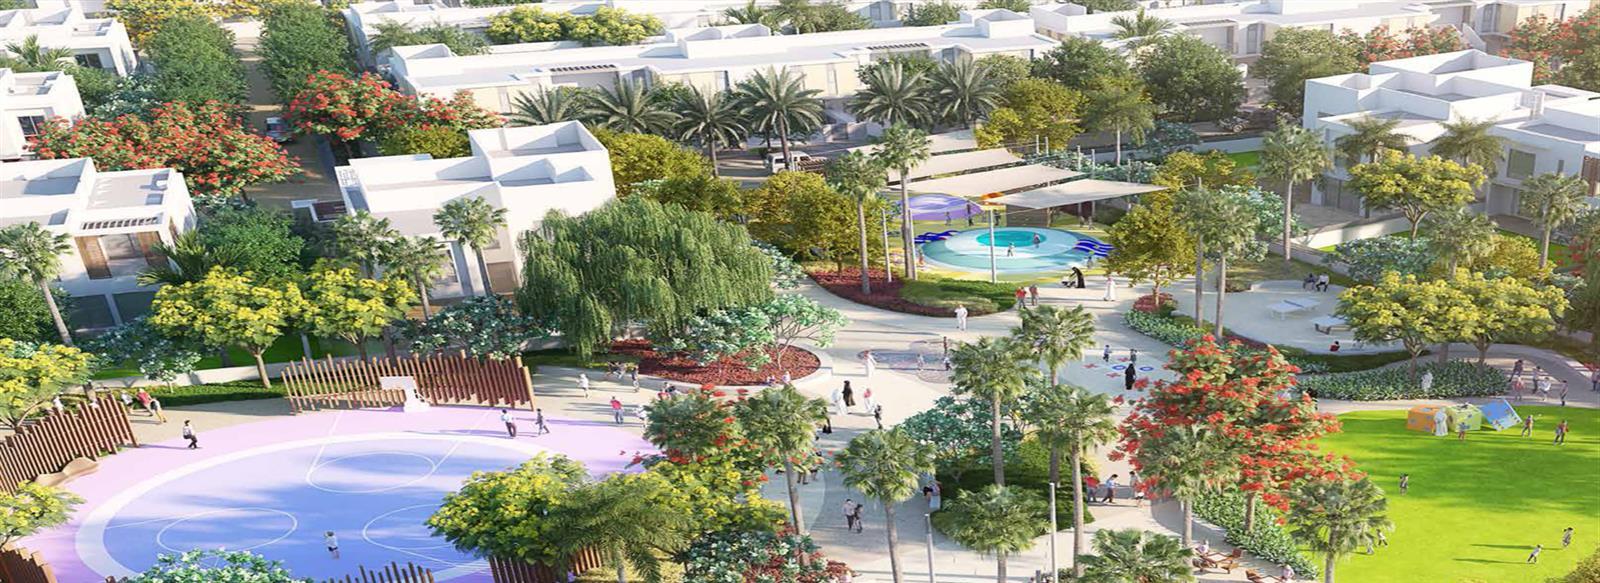 Al Yasmeen by Sharjah Holding at Al Zahia, Sharjah